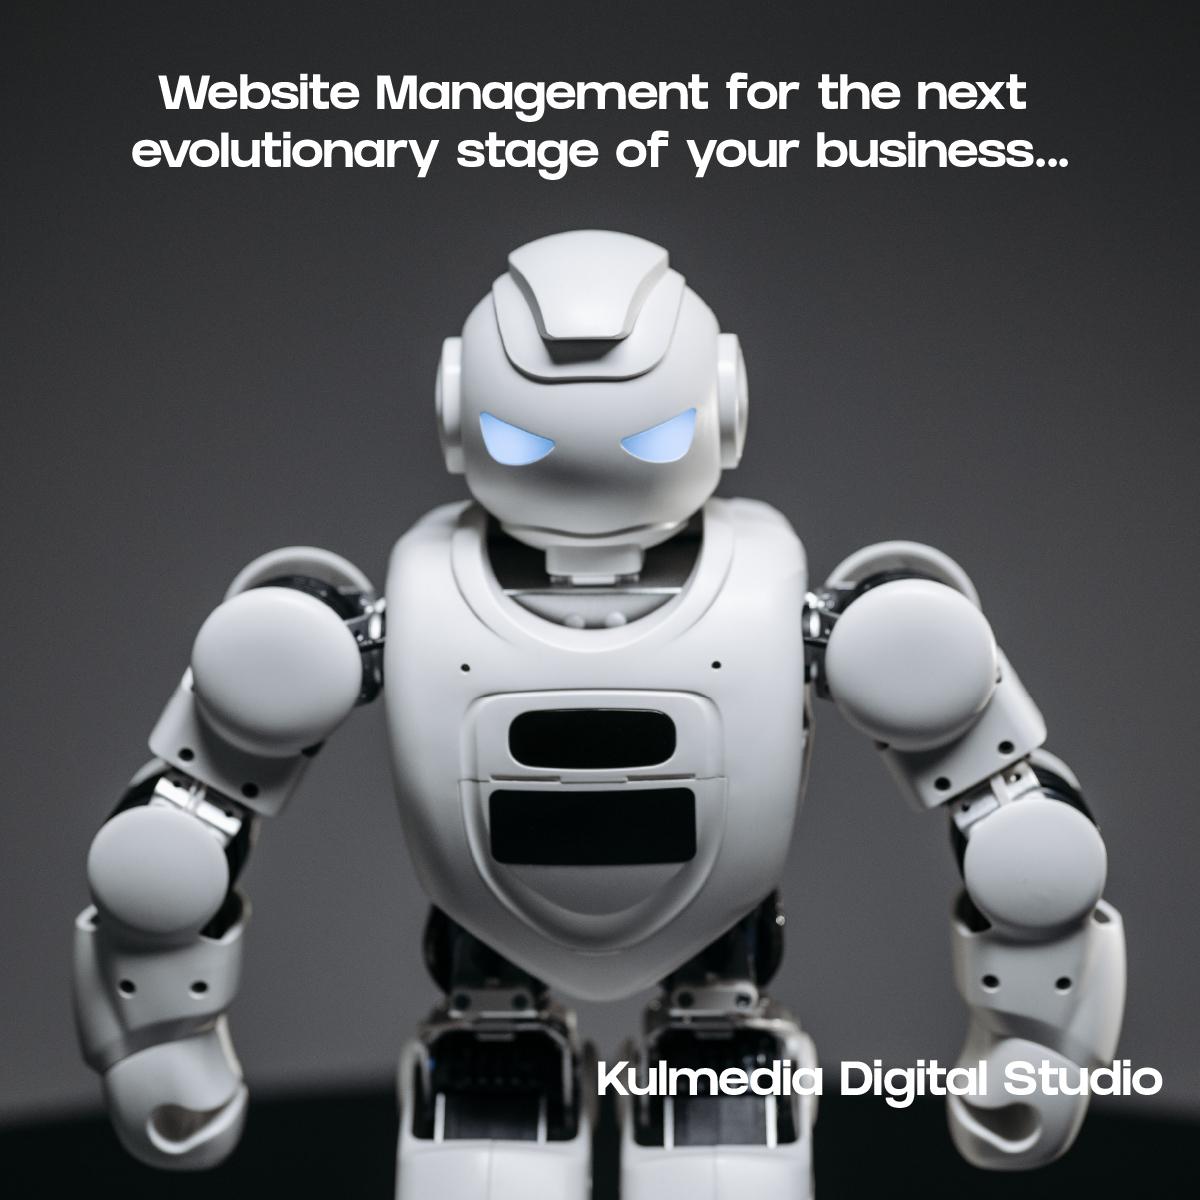 Website Management by Kulmedia Digital Studio